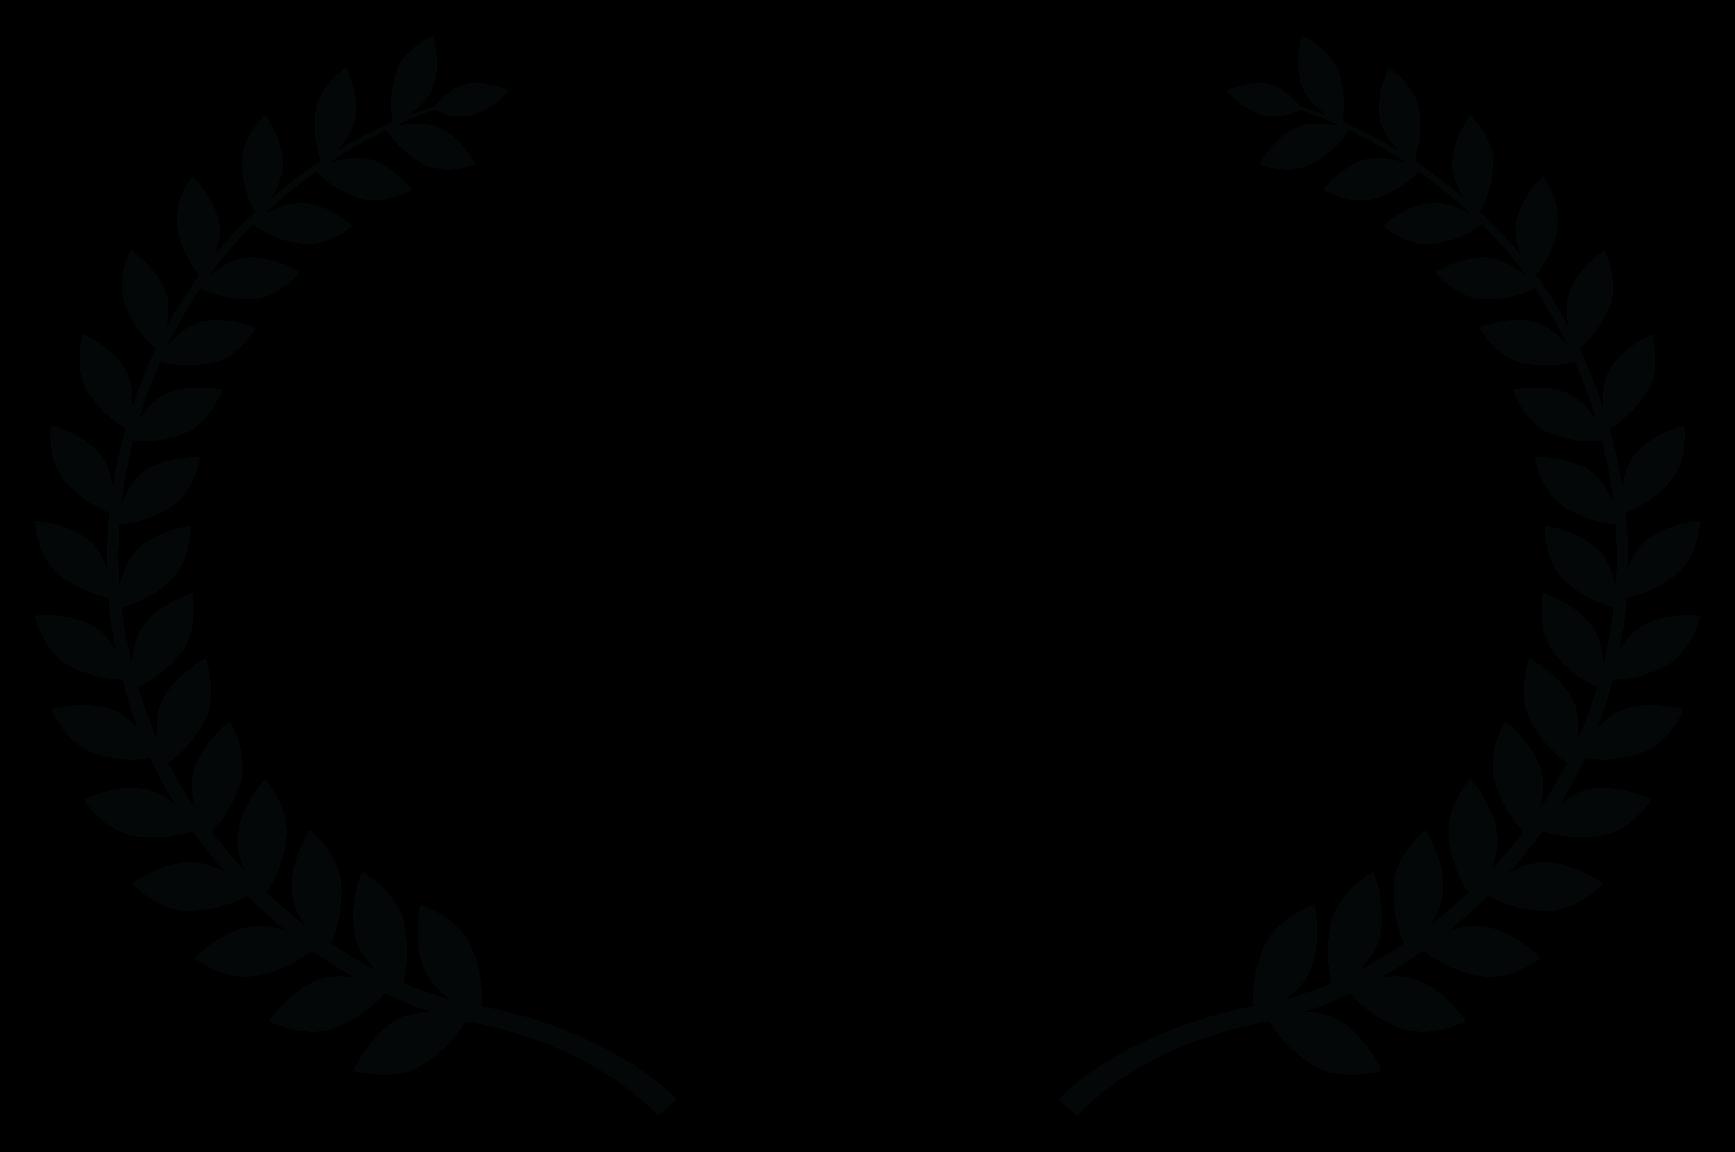 OFFICIAL SELECTION - Emerging Lens Cultural Film Festival - White Bk.png